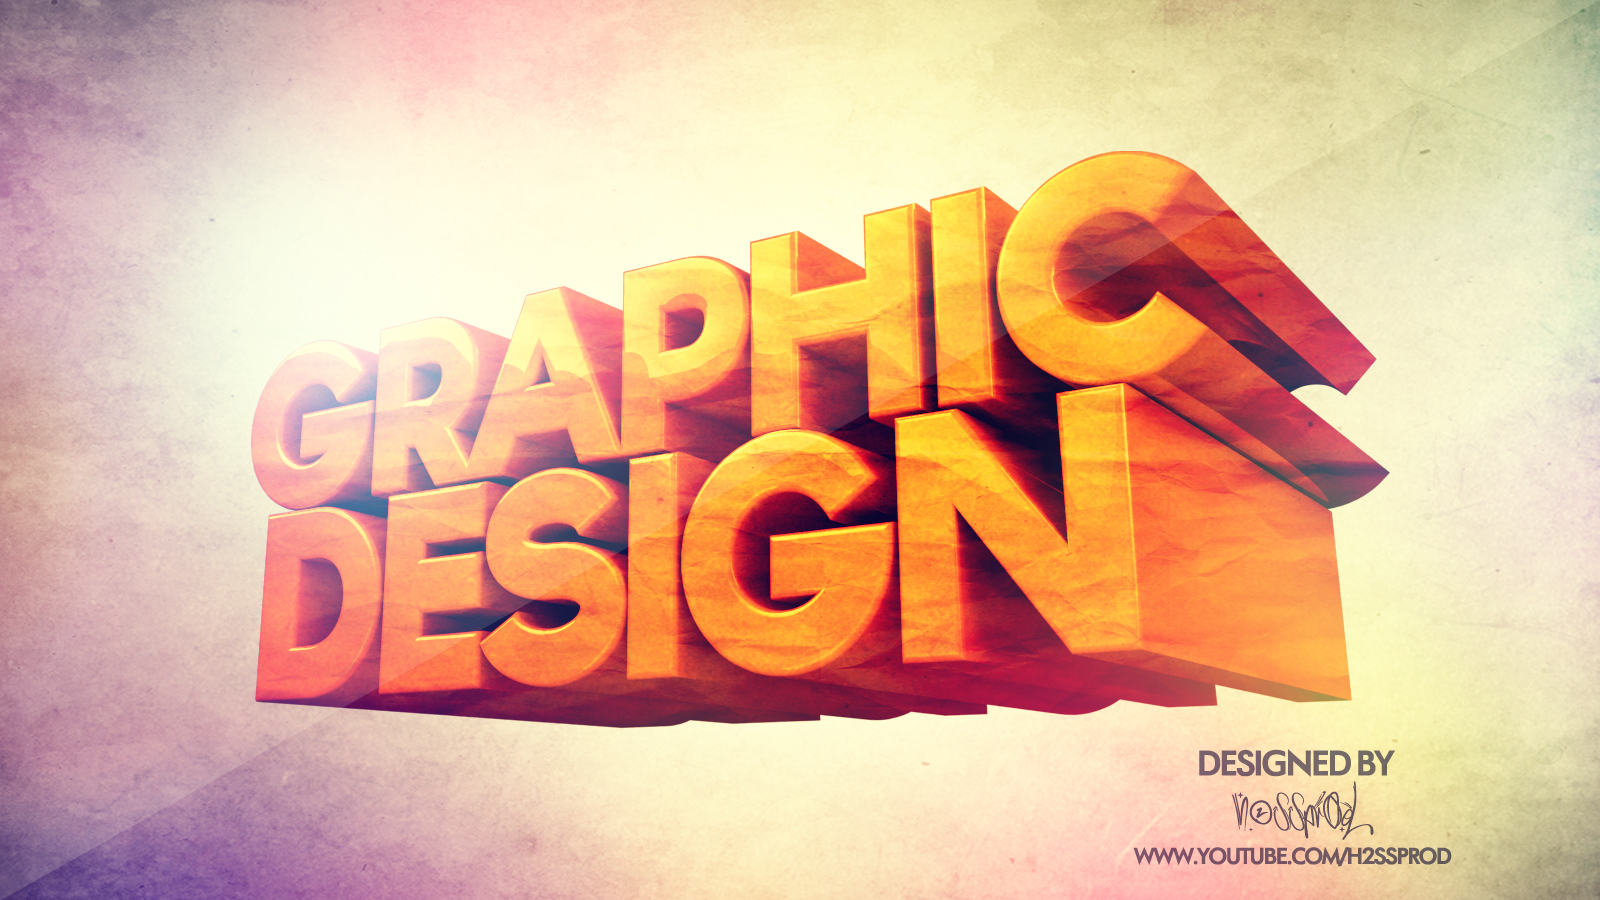 1600x900px Wallpaper Sticker Design Wallpapersafari